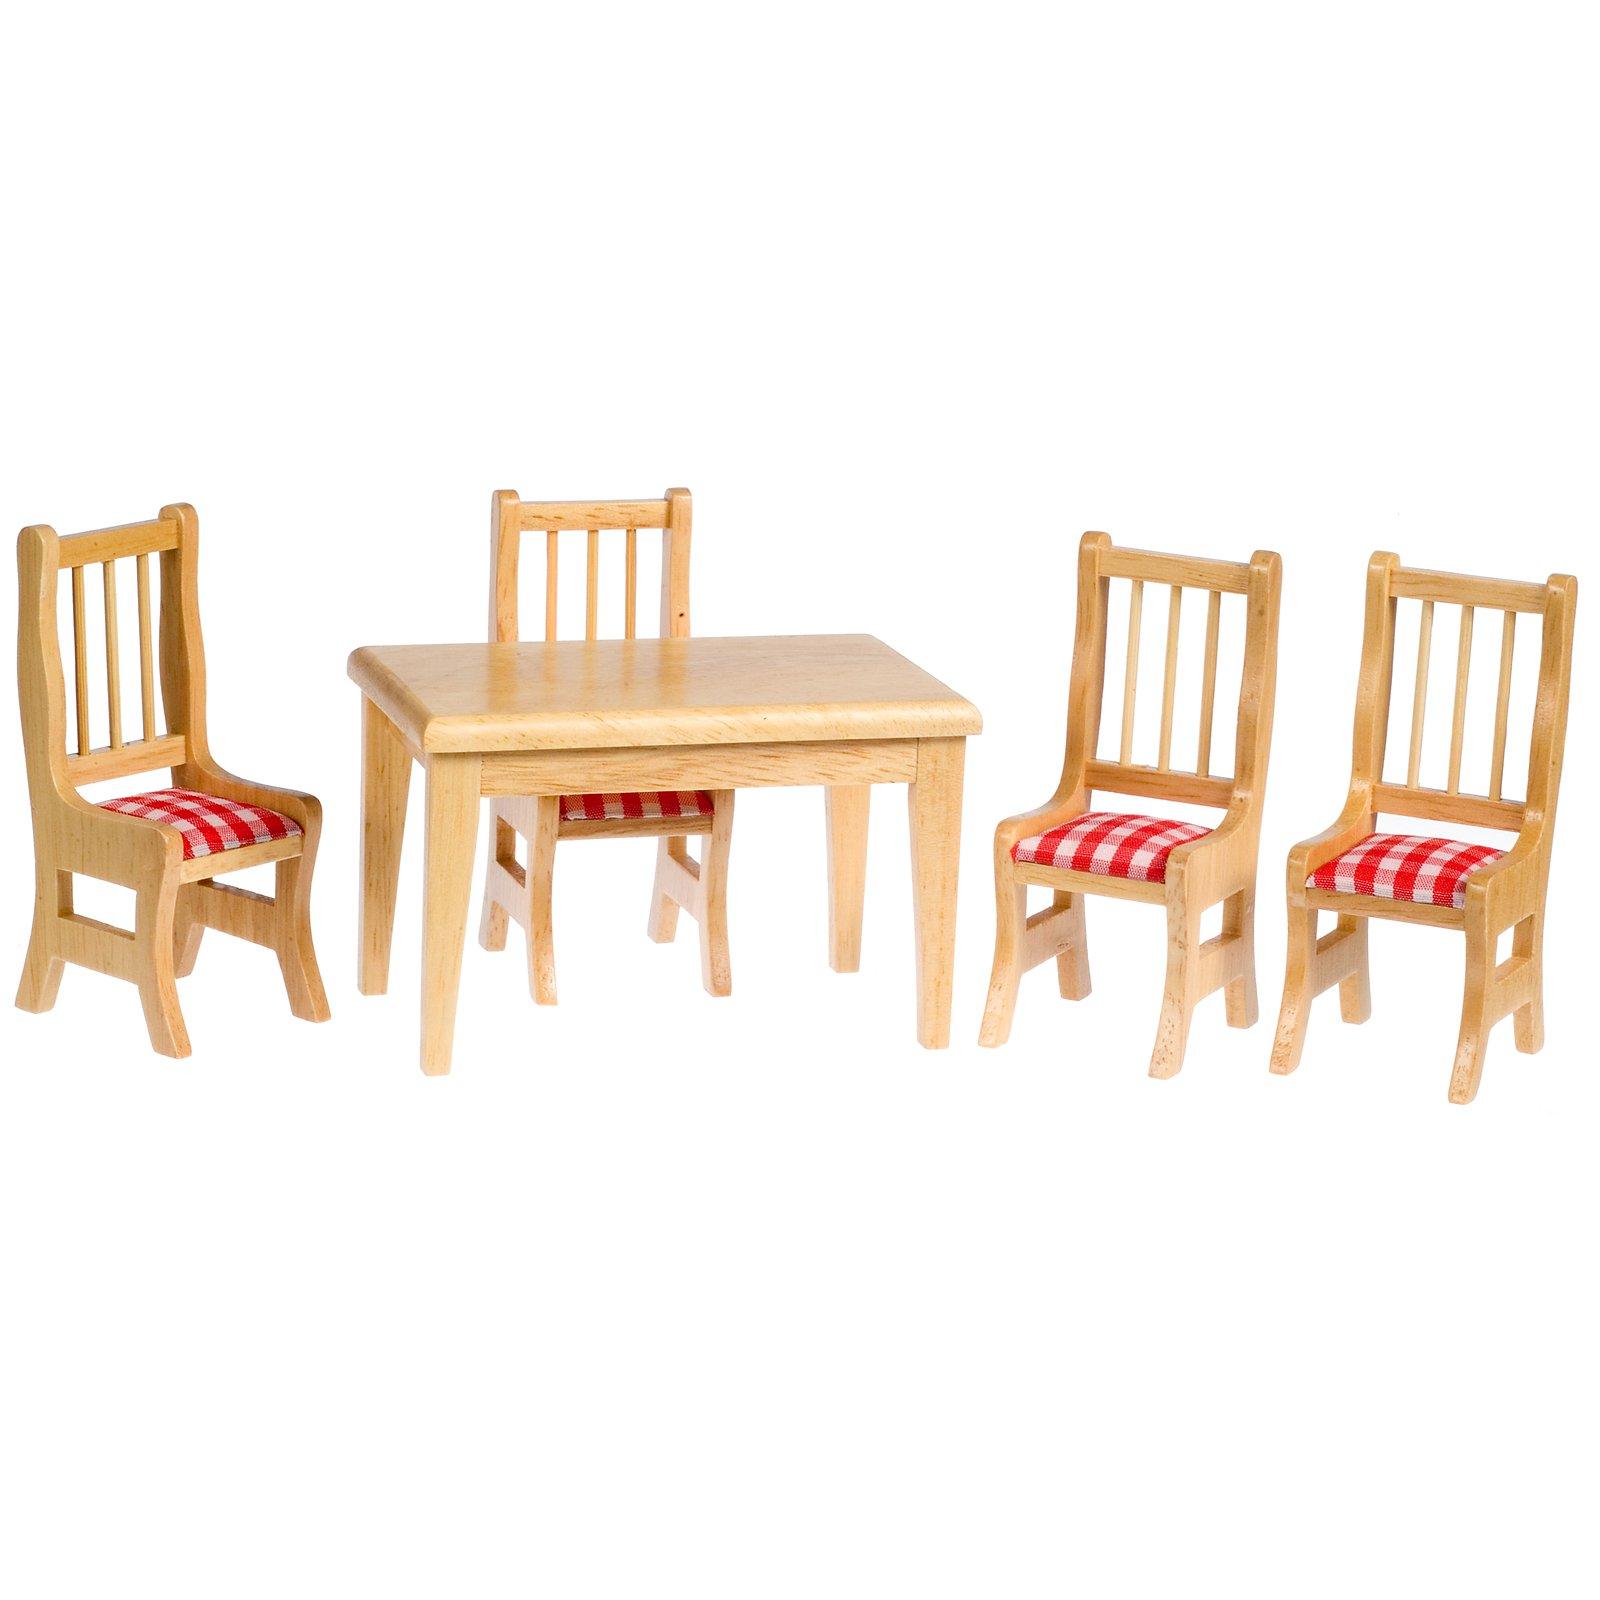 Oak Dining Dollhouse Miniature Set with Cushions